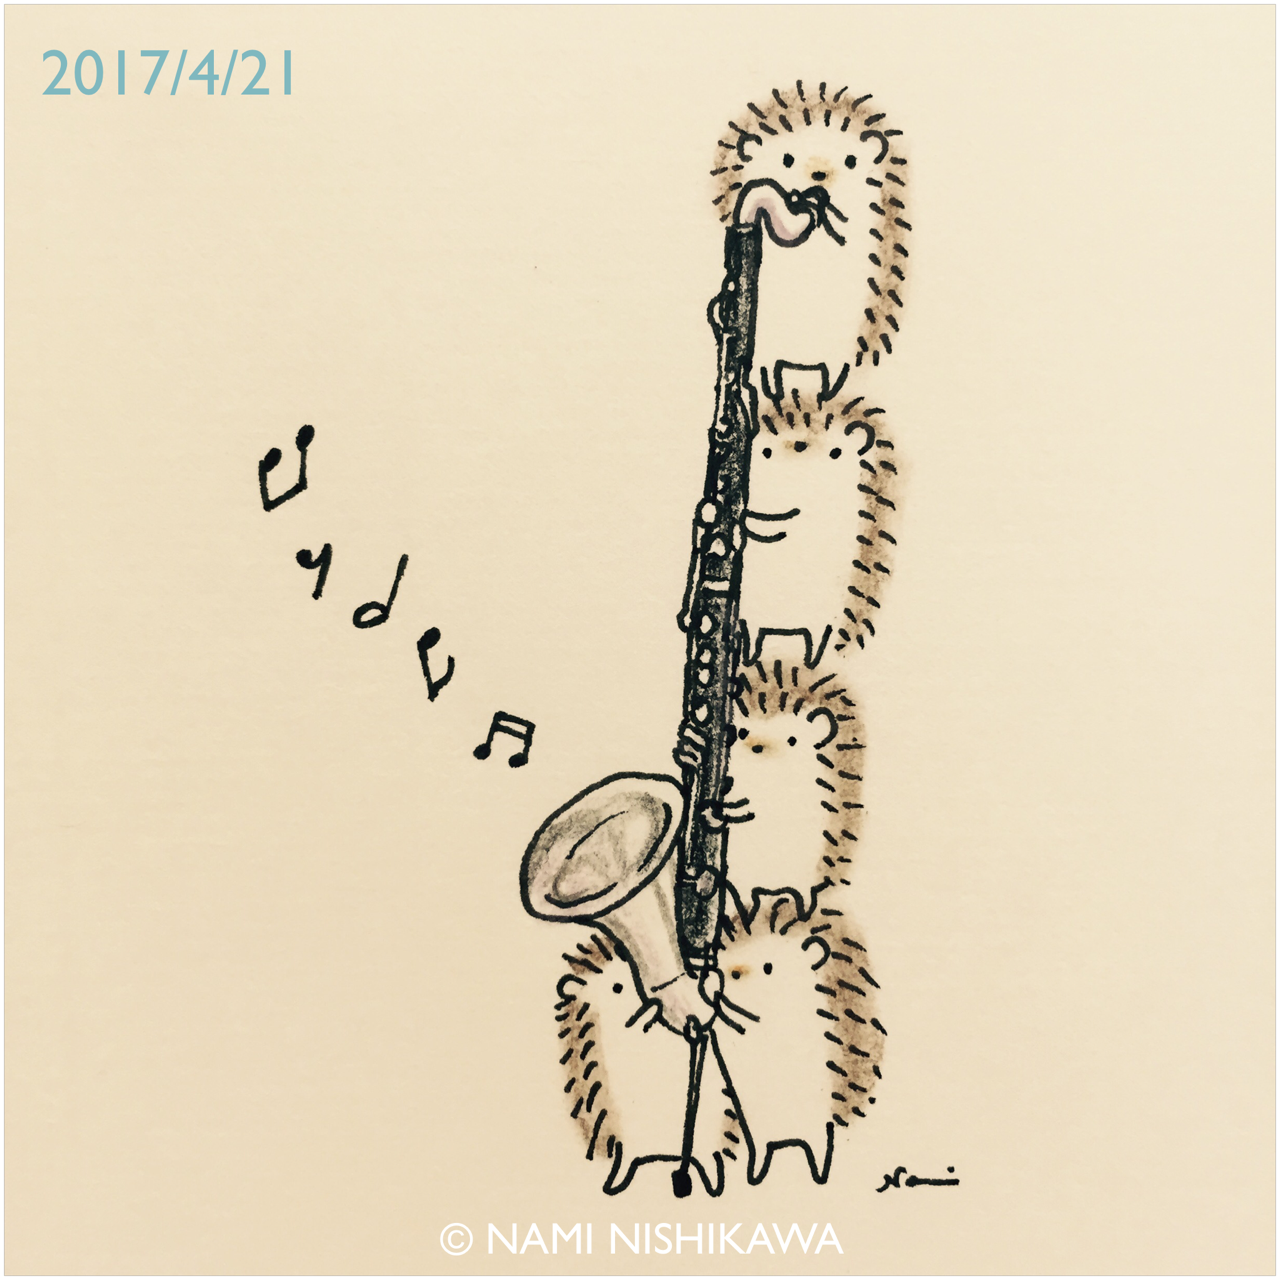 1280x1280 1153 Bass Clarinet Naminishikawa